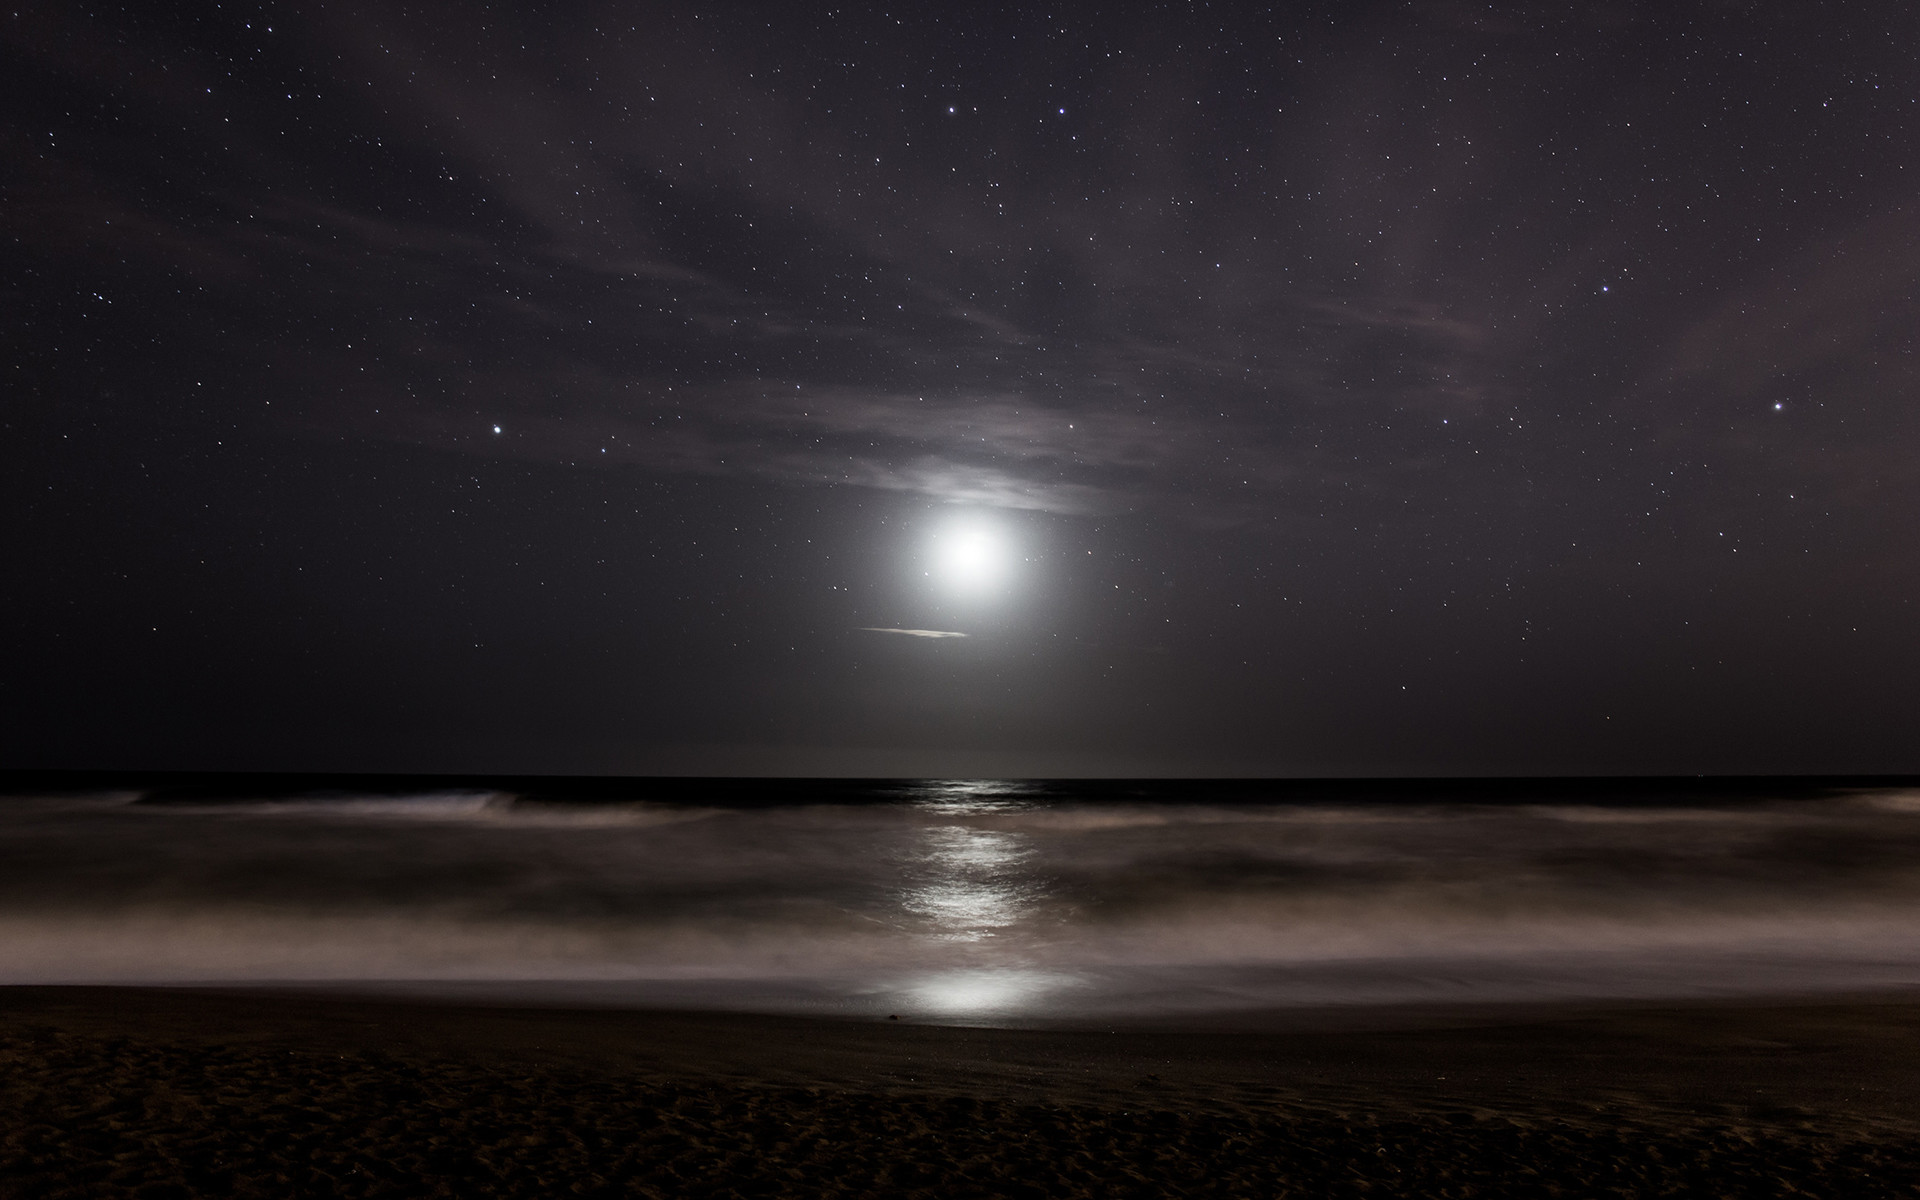 Stars Moonlight Ocean sea reflection sky waves beach night wallpaper      104223   WallpaperUP